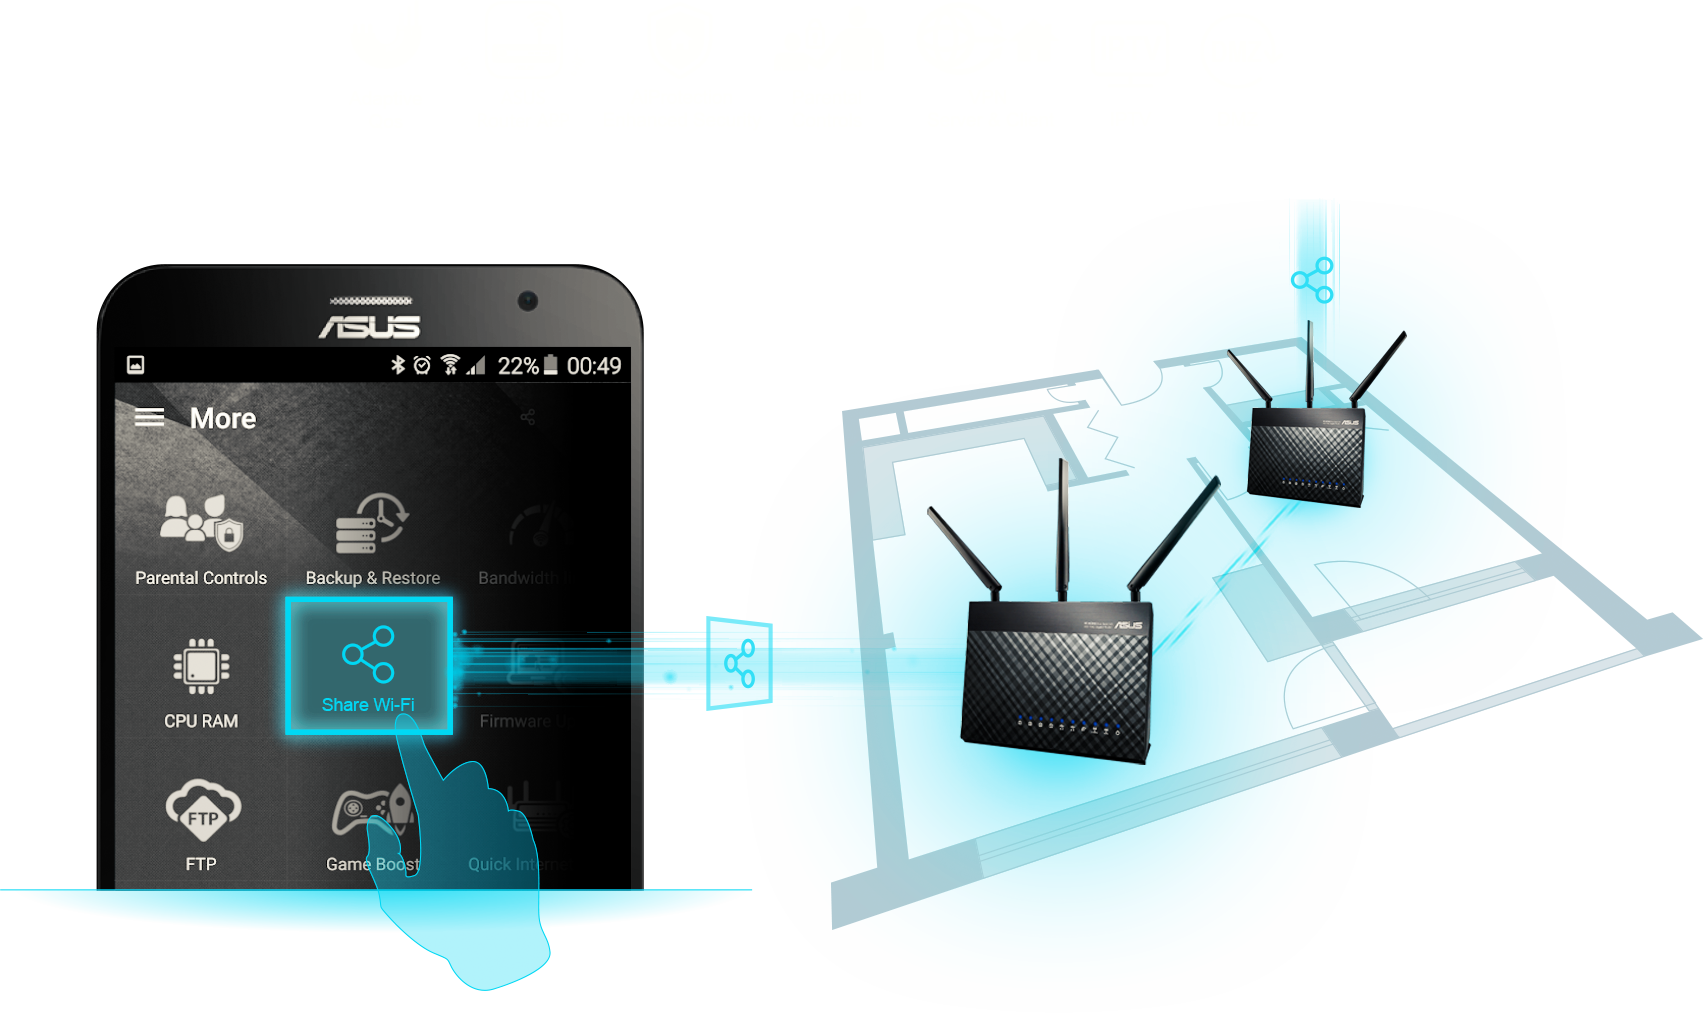 AiMesh AC1900 WiFi System (RT-AC68U 2 Pack) | Networking | ASUS USA